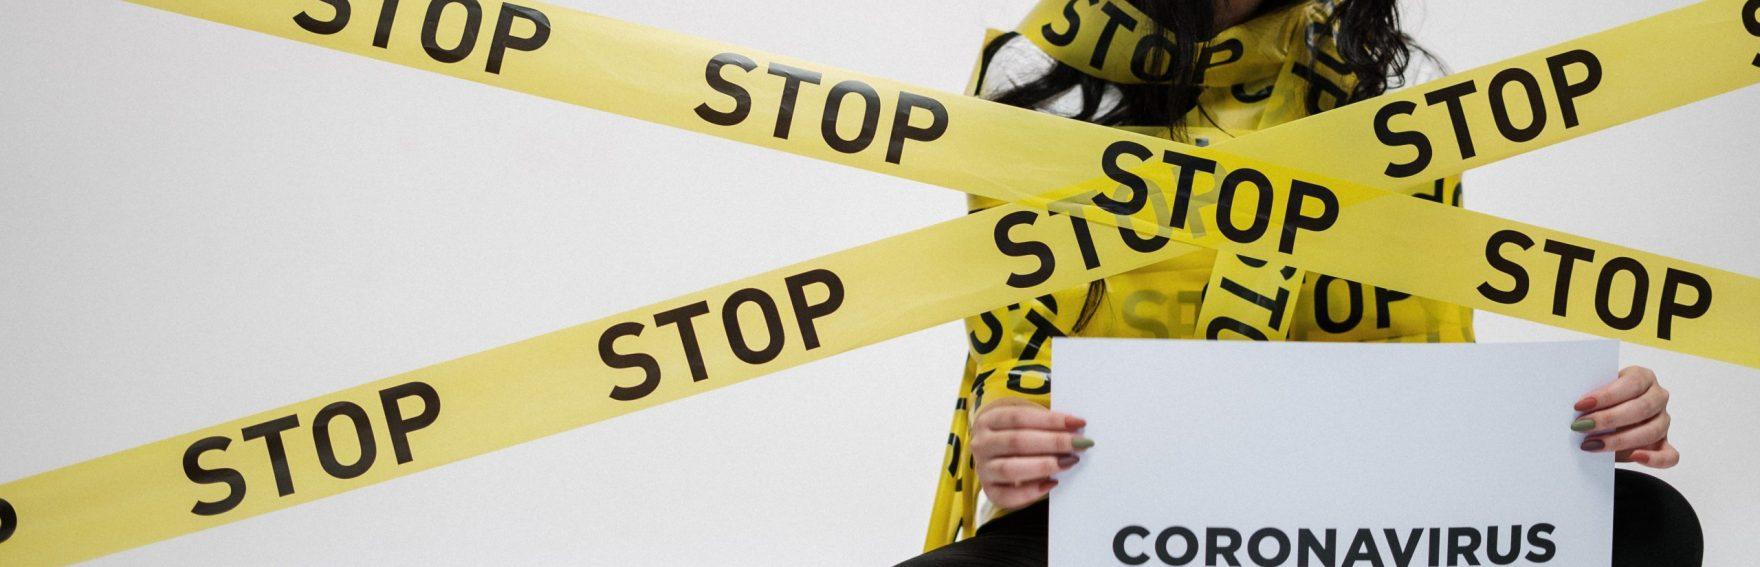 Corona Virus Clean up covid19